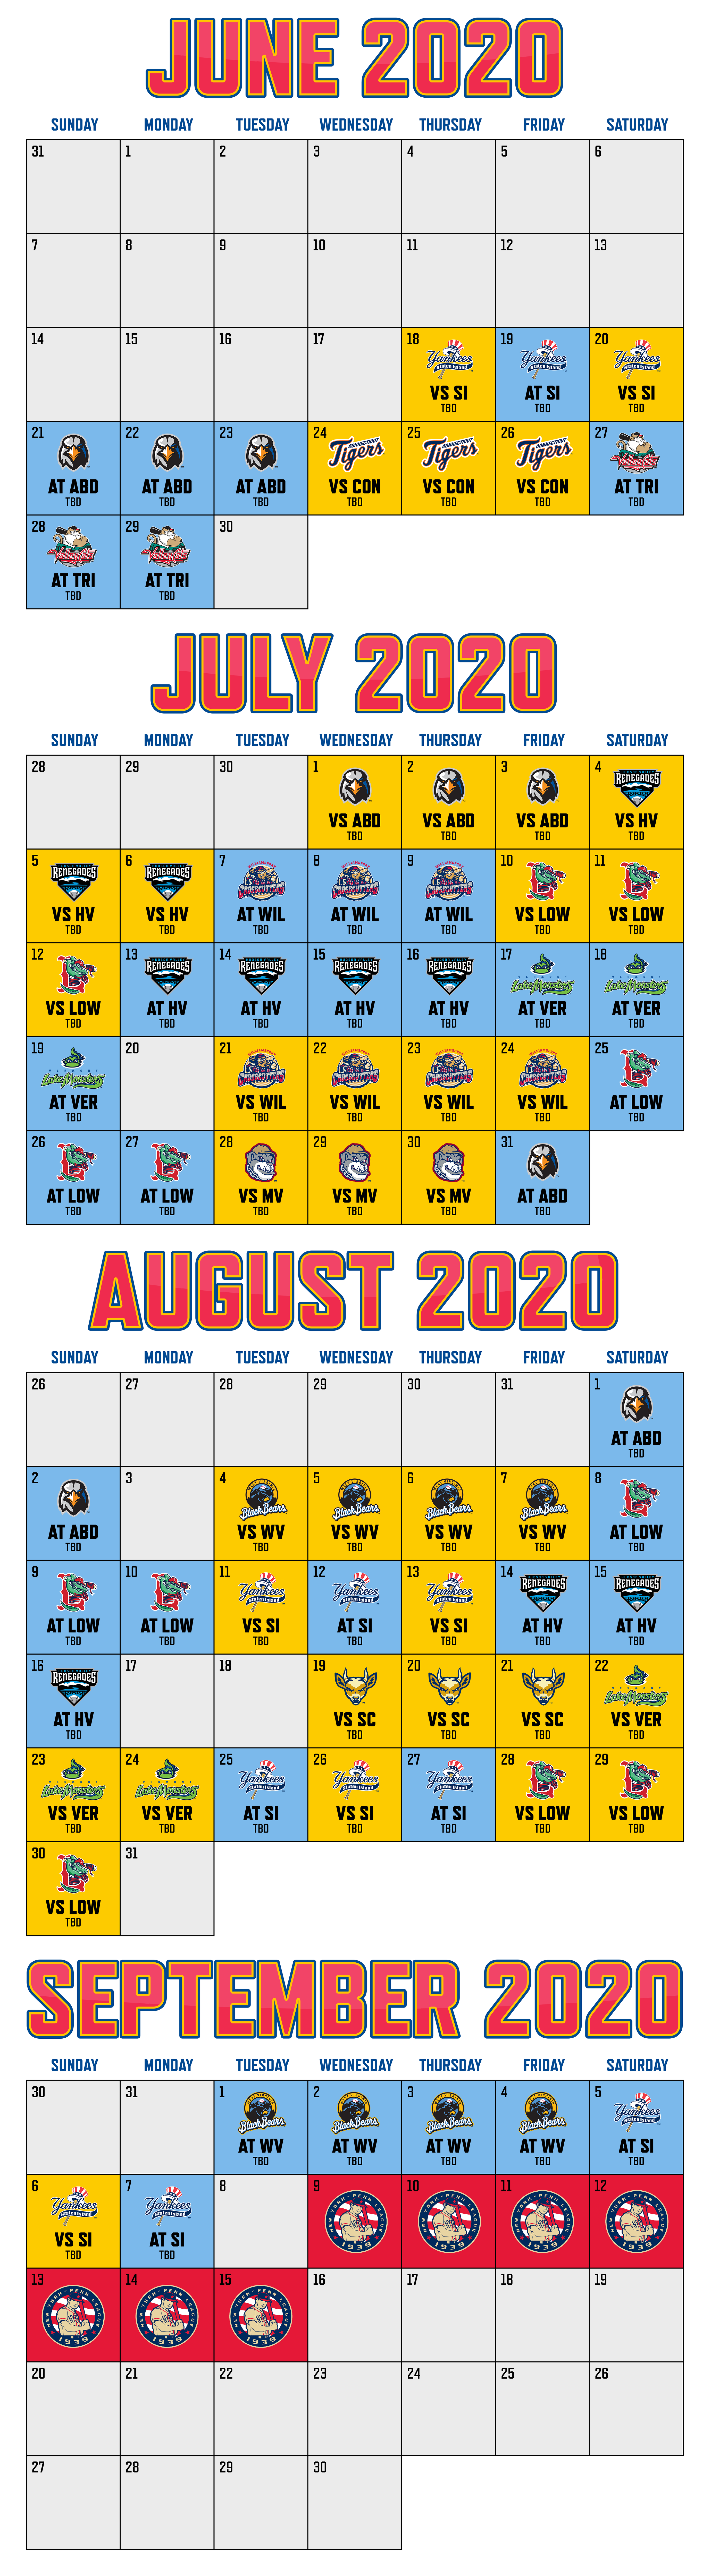 Ny Yankees 2020 Schedule.Yankees Schedule 2019 Regular Season Cleveland Indians 2019